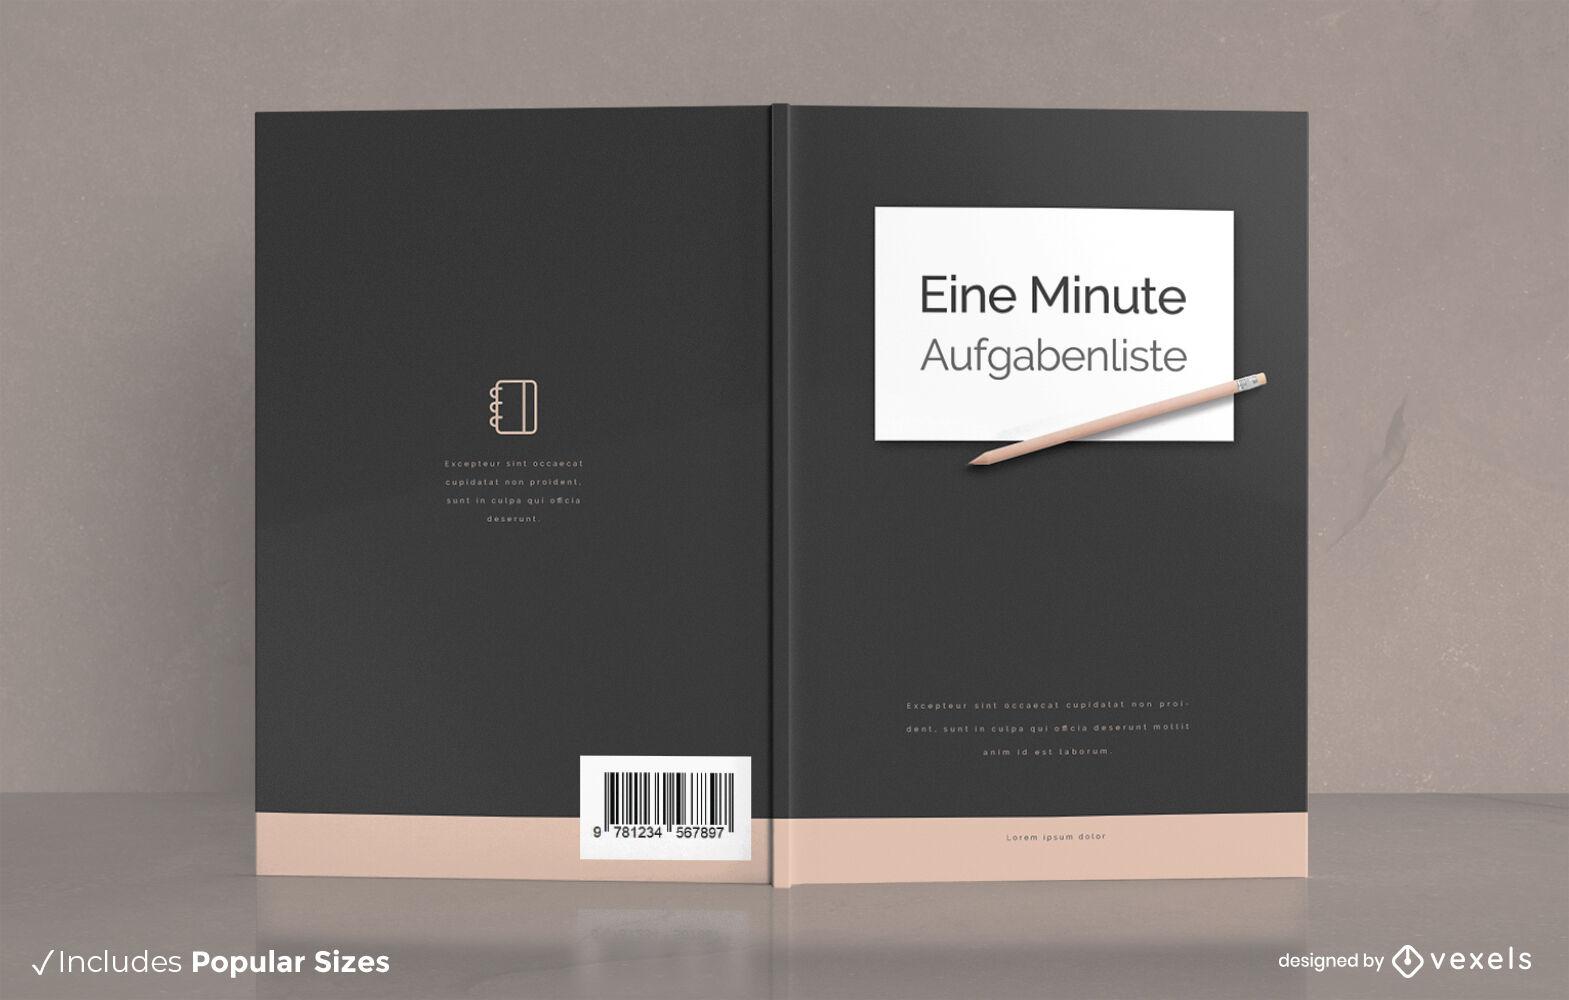 Request written assignments book cover design